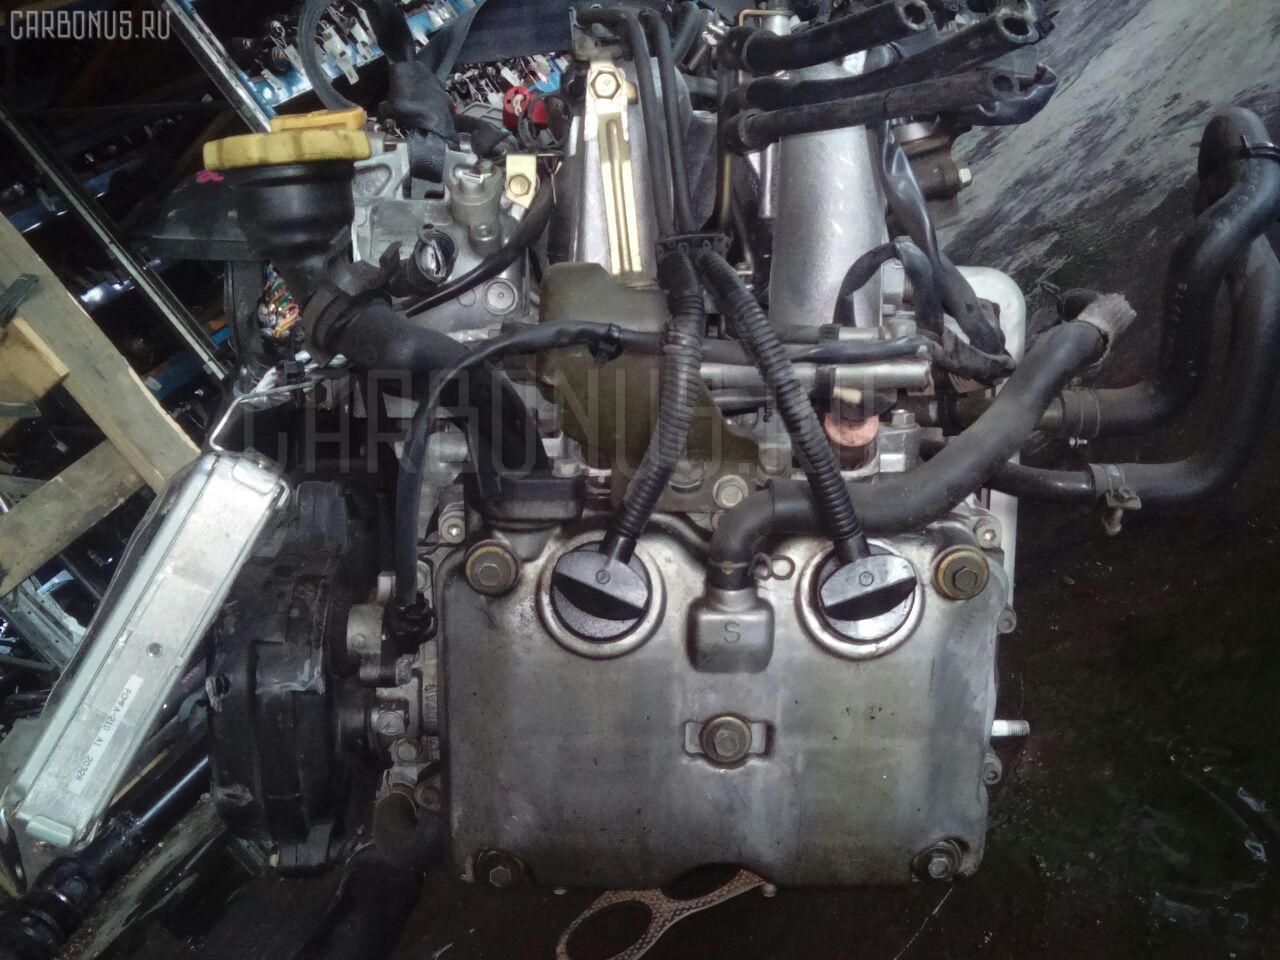 Двигатель SUBARU IMPREZA WAGON GG2 EJ15 Фото 9